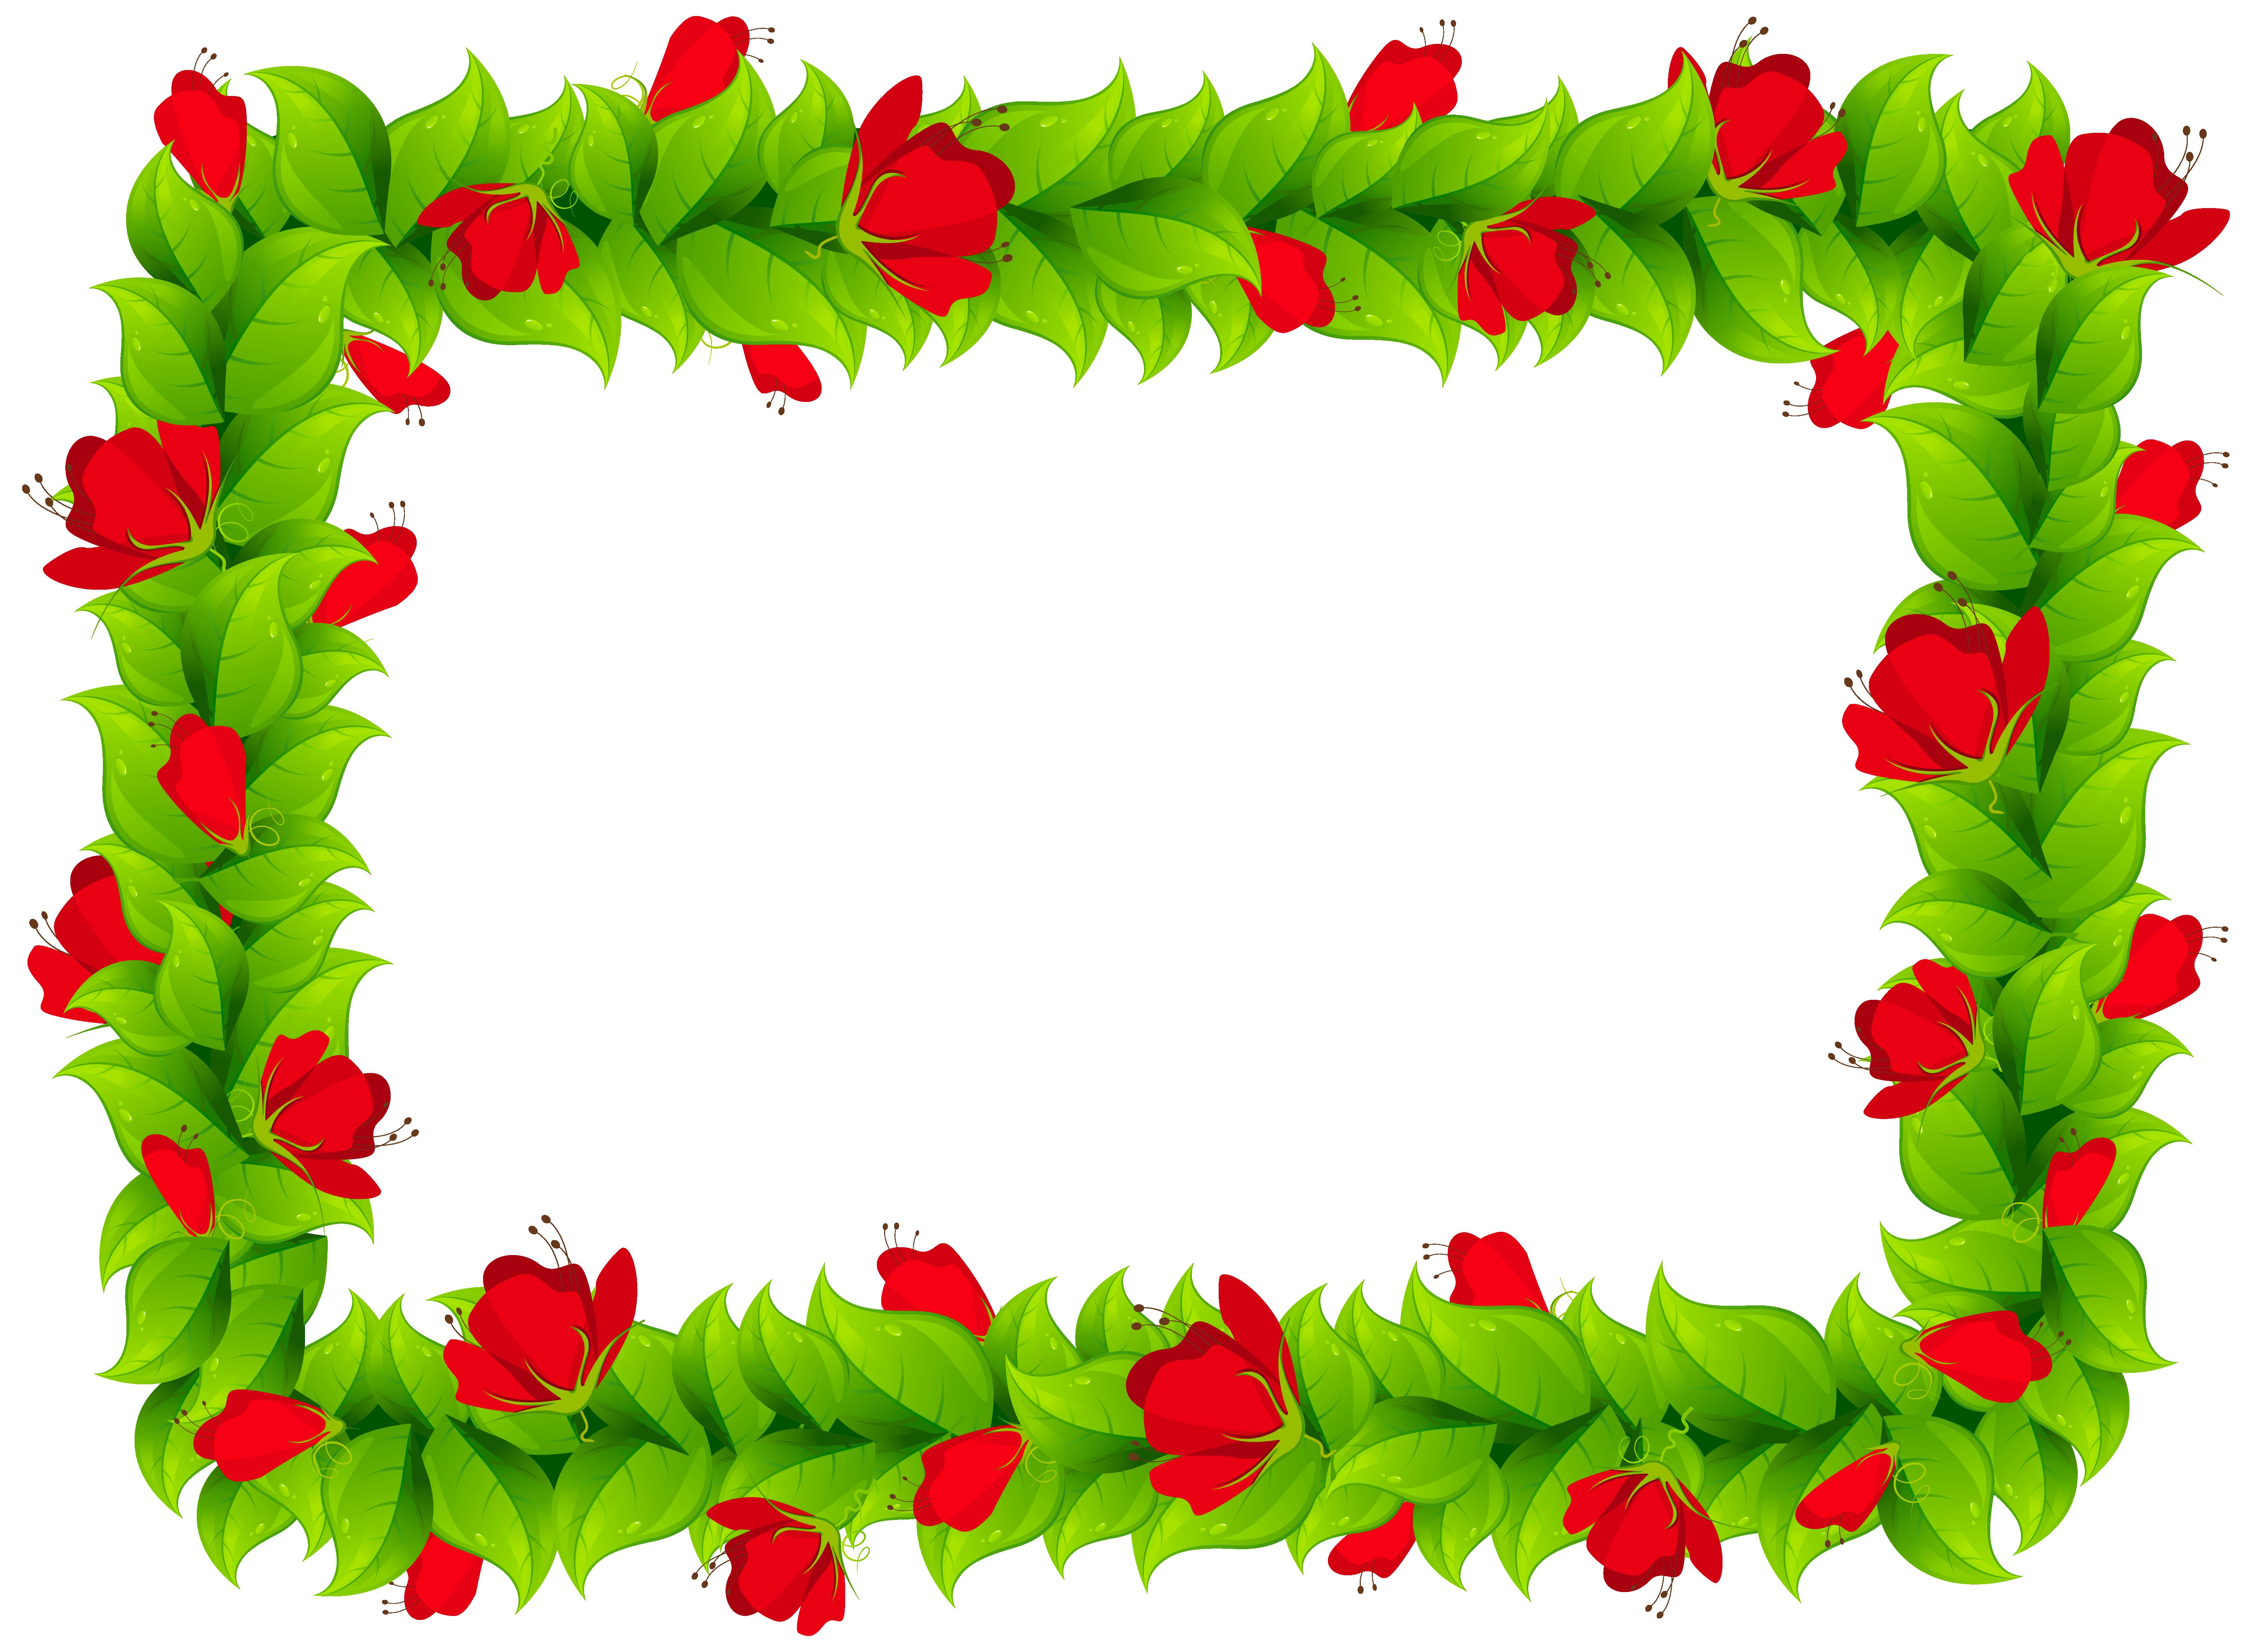 vector royalty free download Frame clipart. Floral border png image